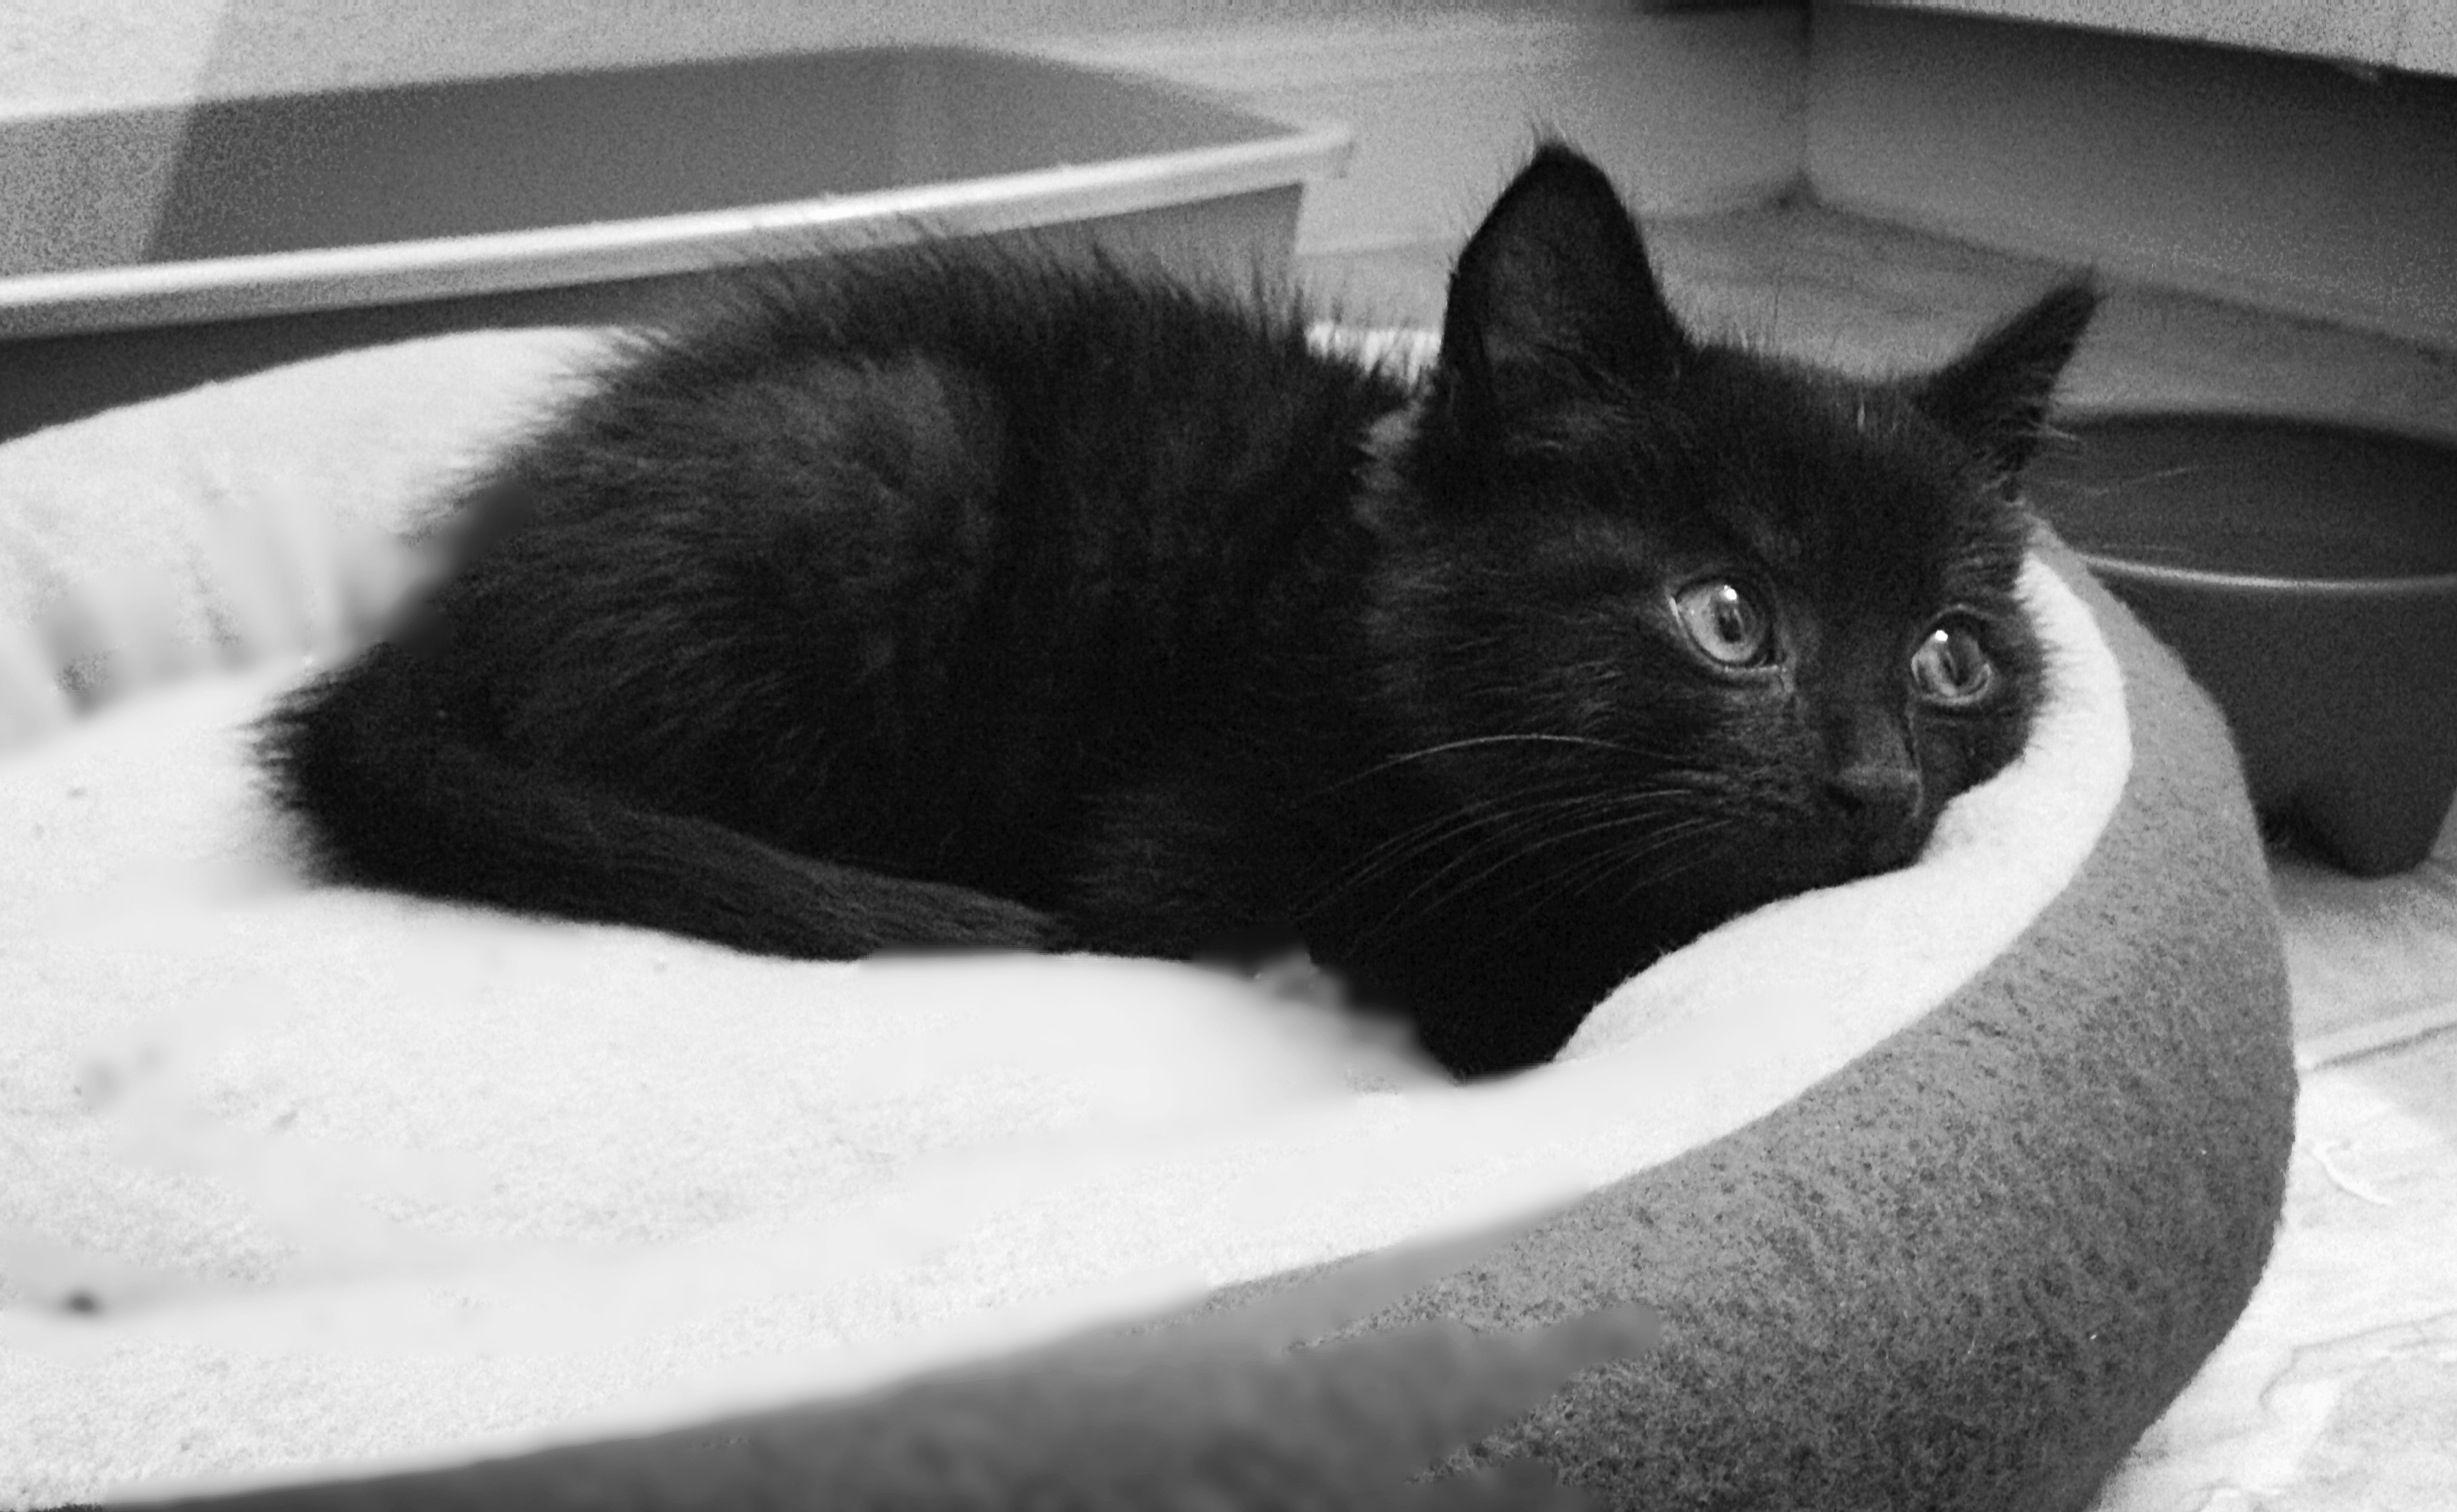 ~Black Kitten~ #HisNameIsAsh #Blackcats @catwisdom101